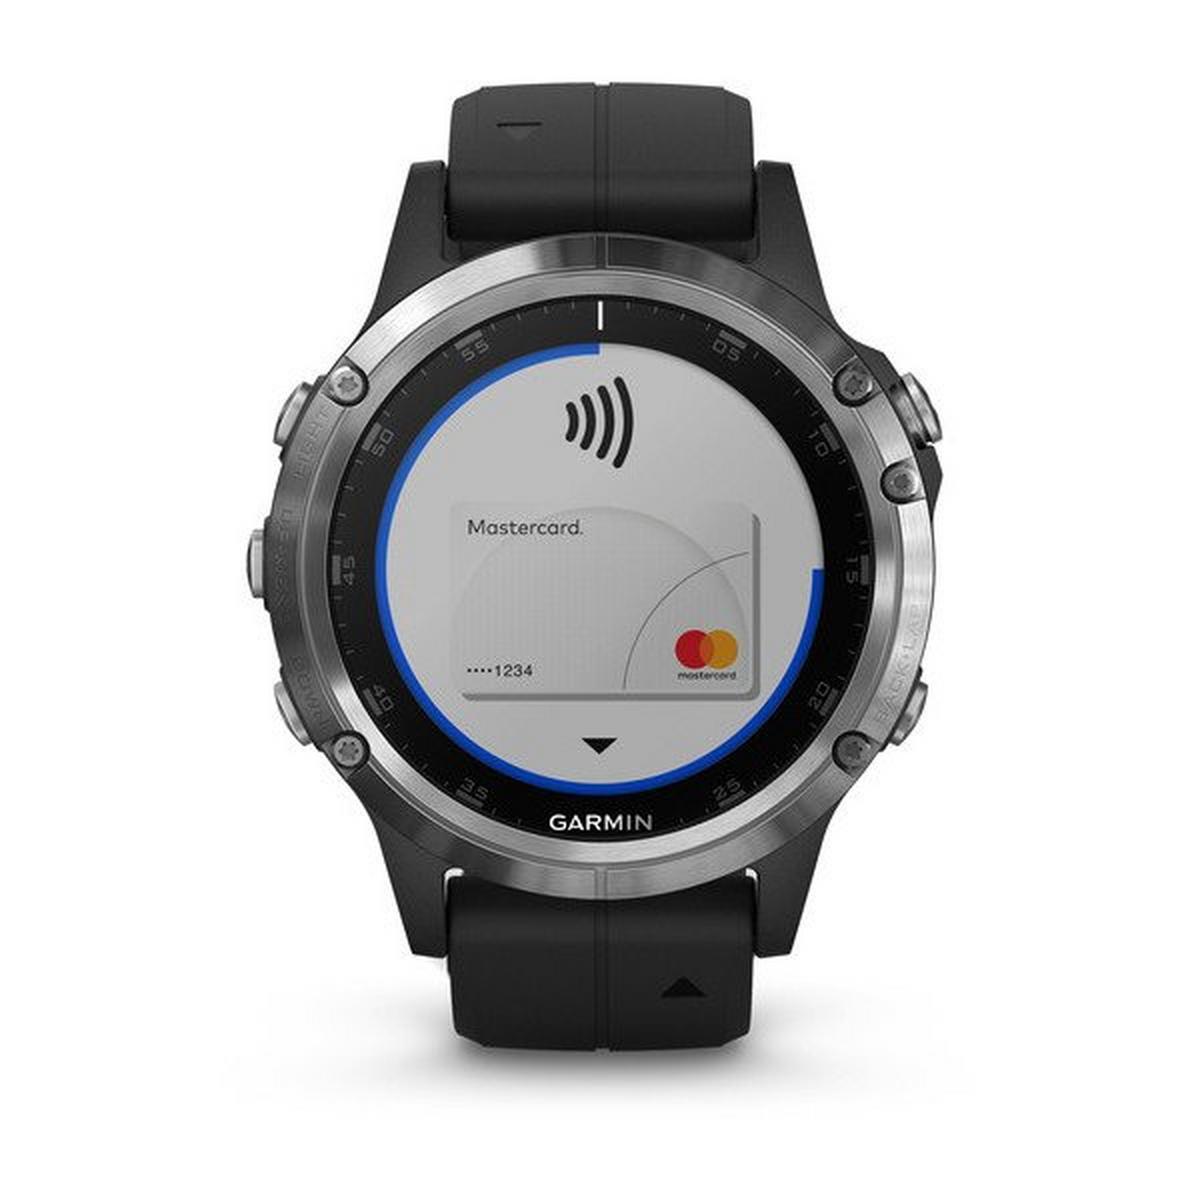 Garmin GPS Watch  Fenix 5 Plus Silver with Black Band